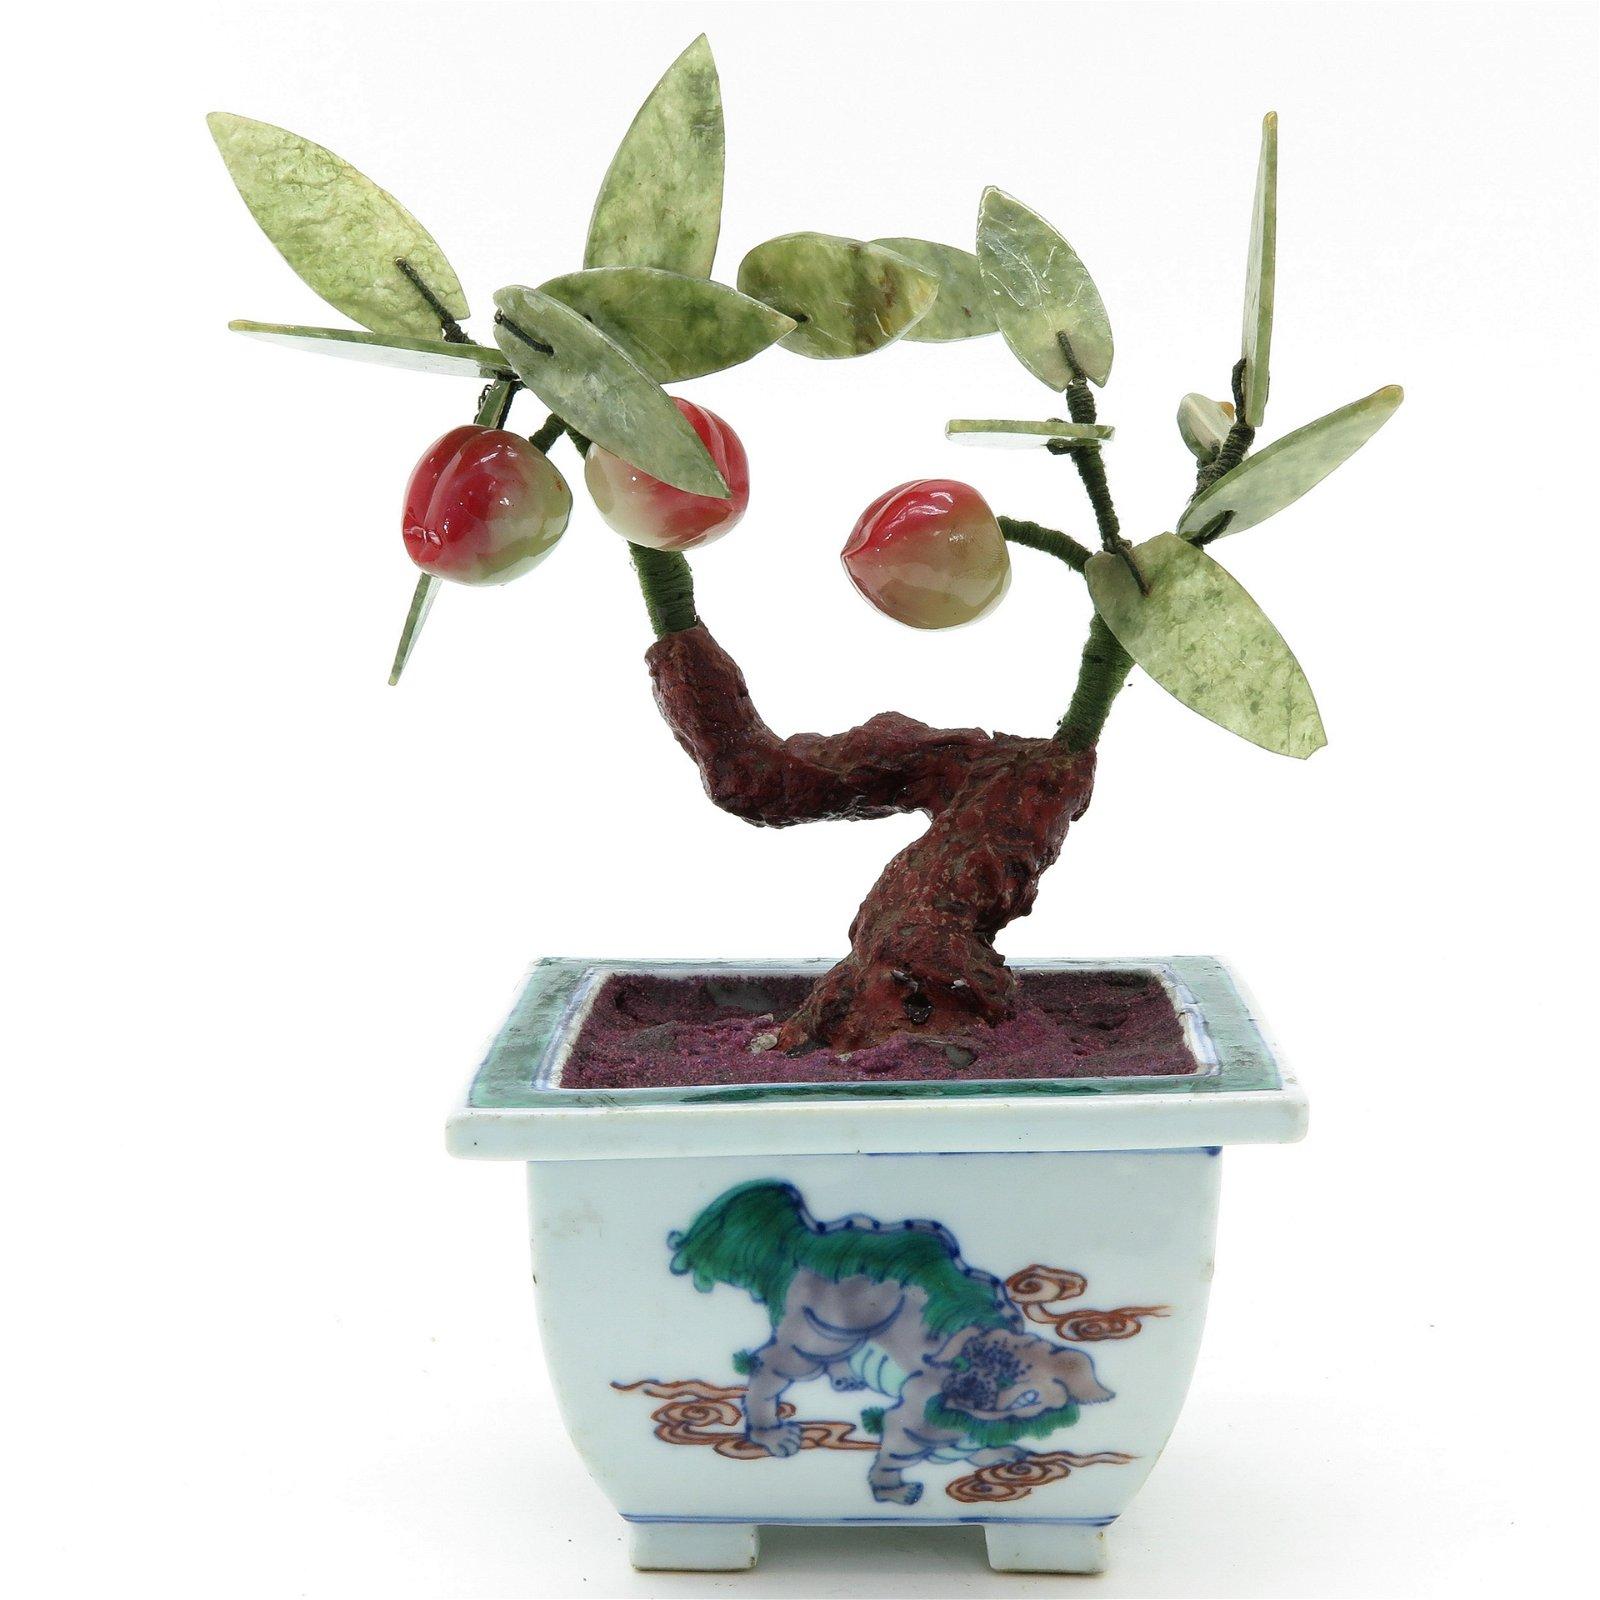 A Jade Floral Sculpture